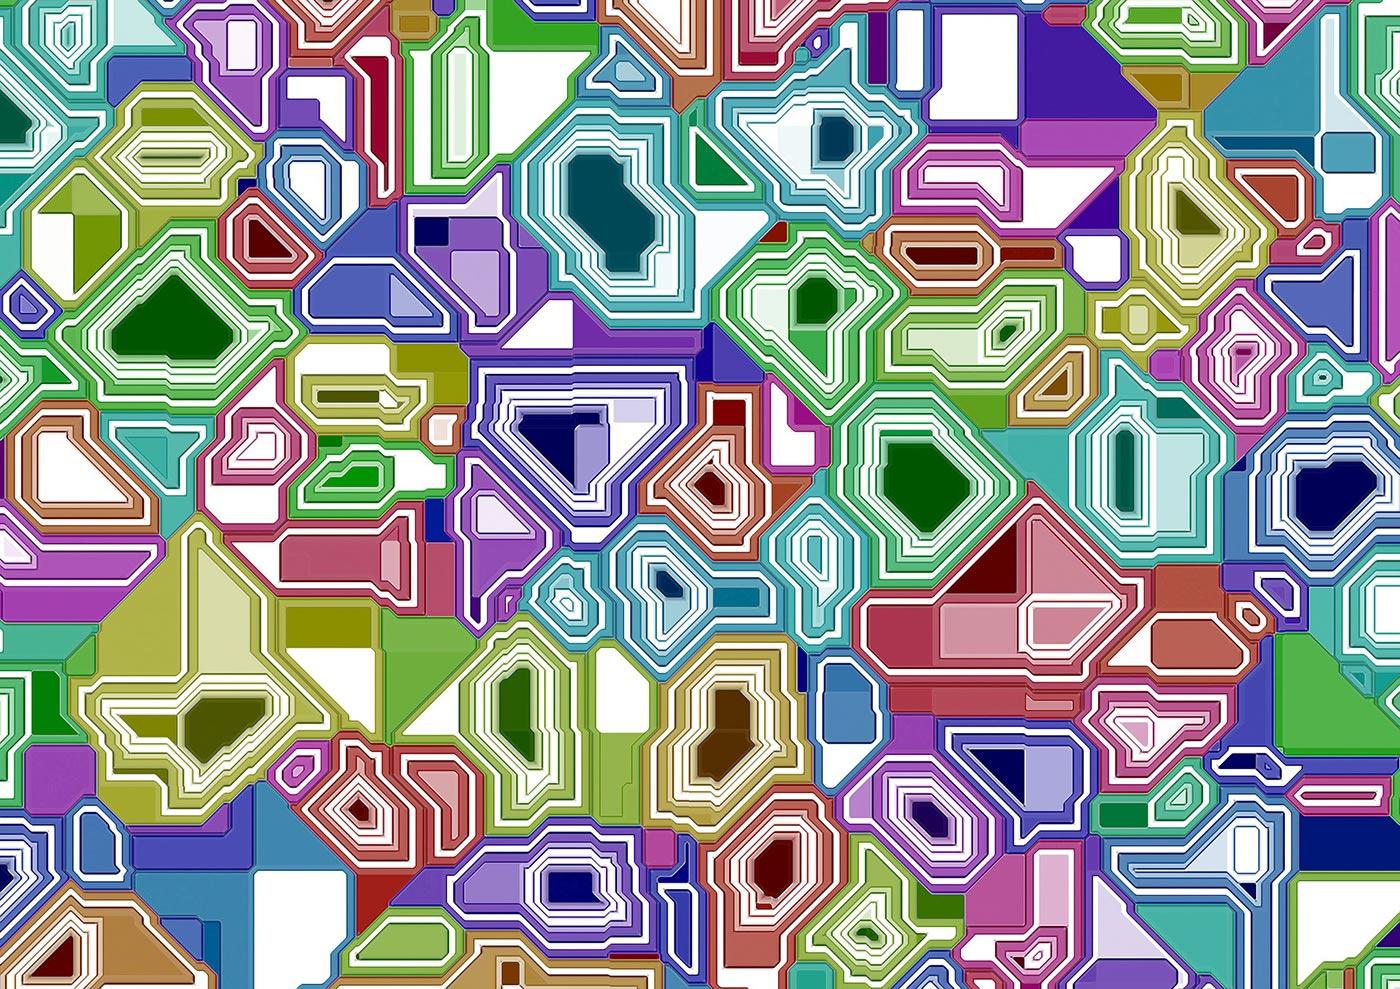 Illustration of interfaces